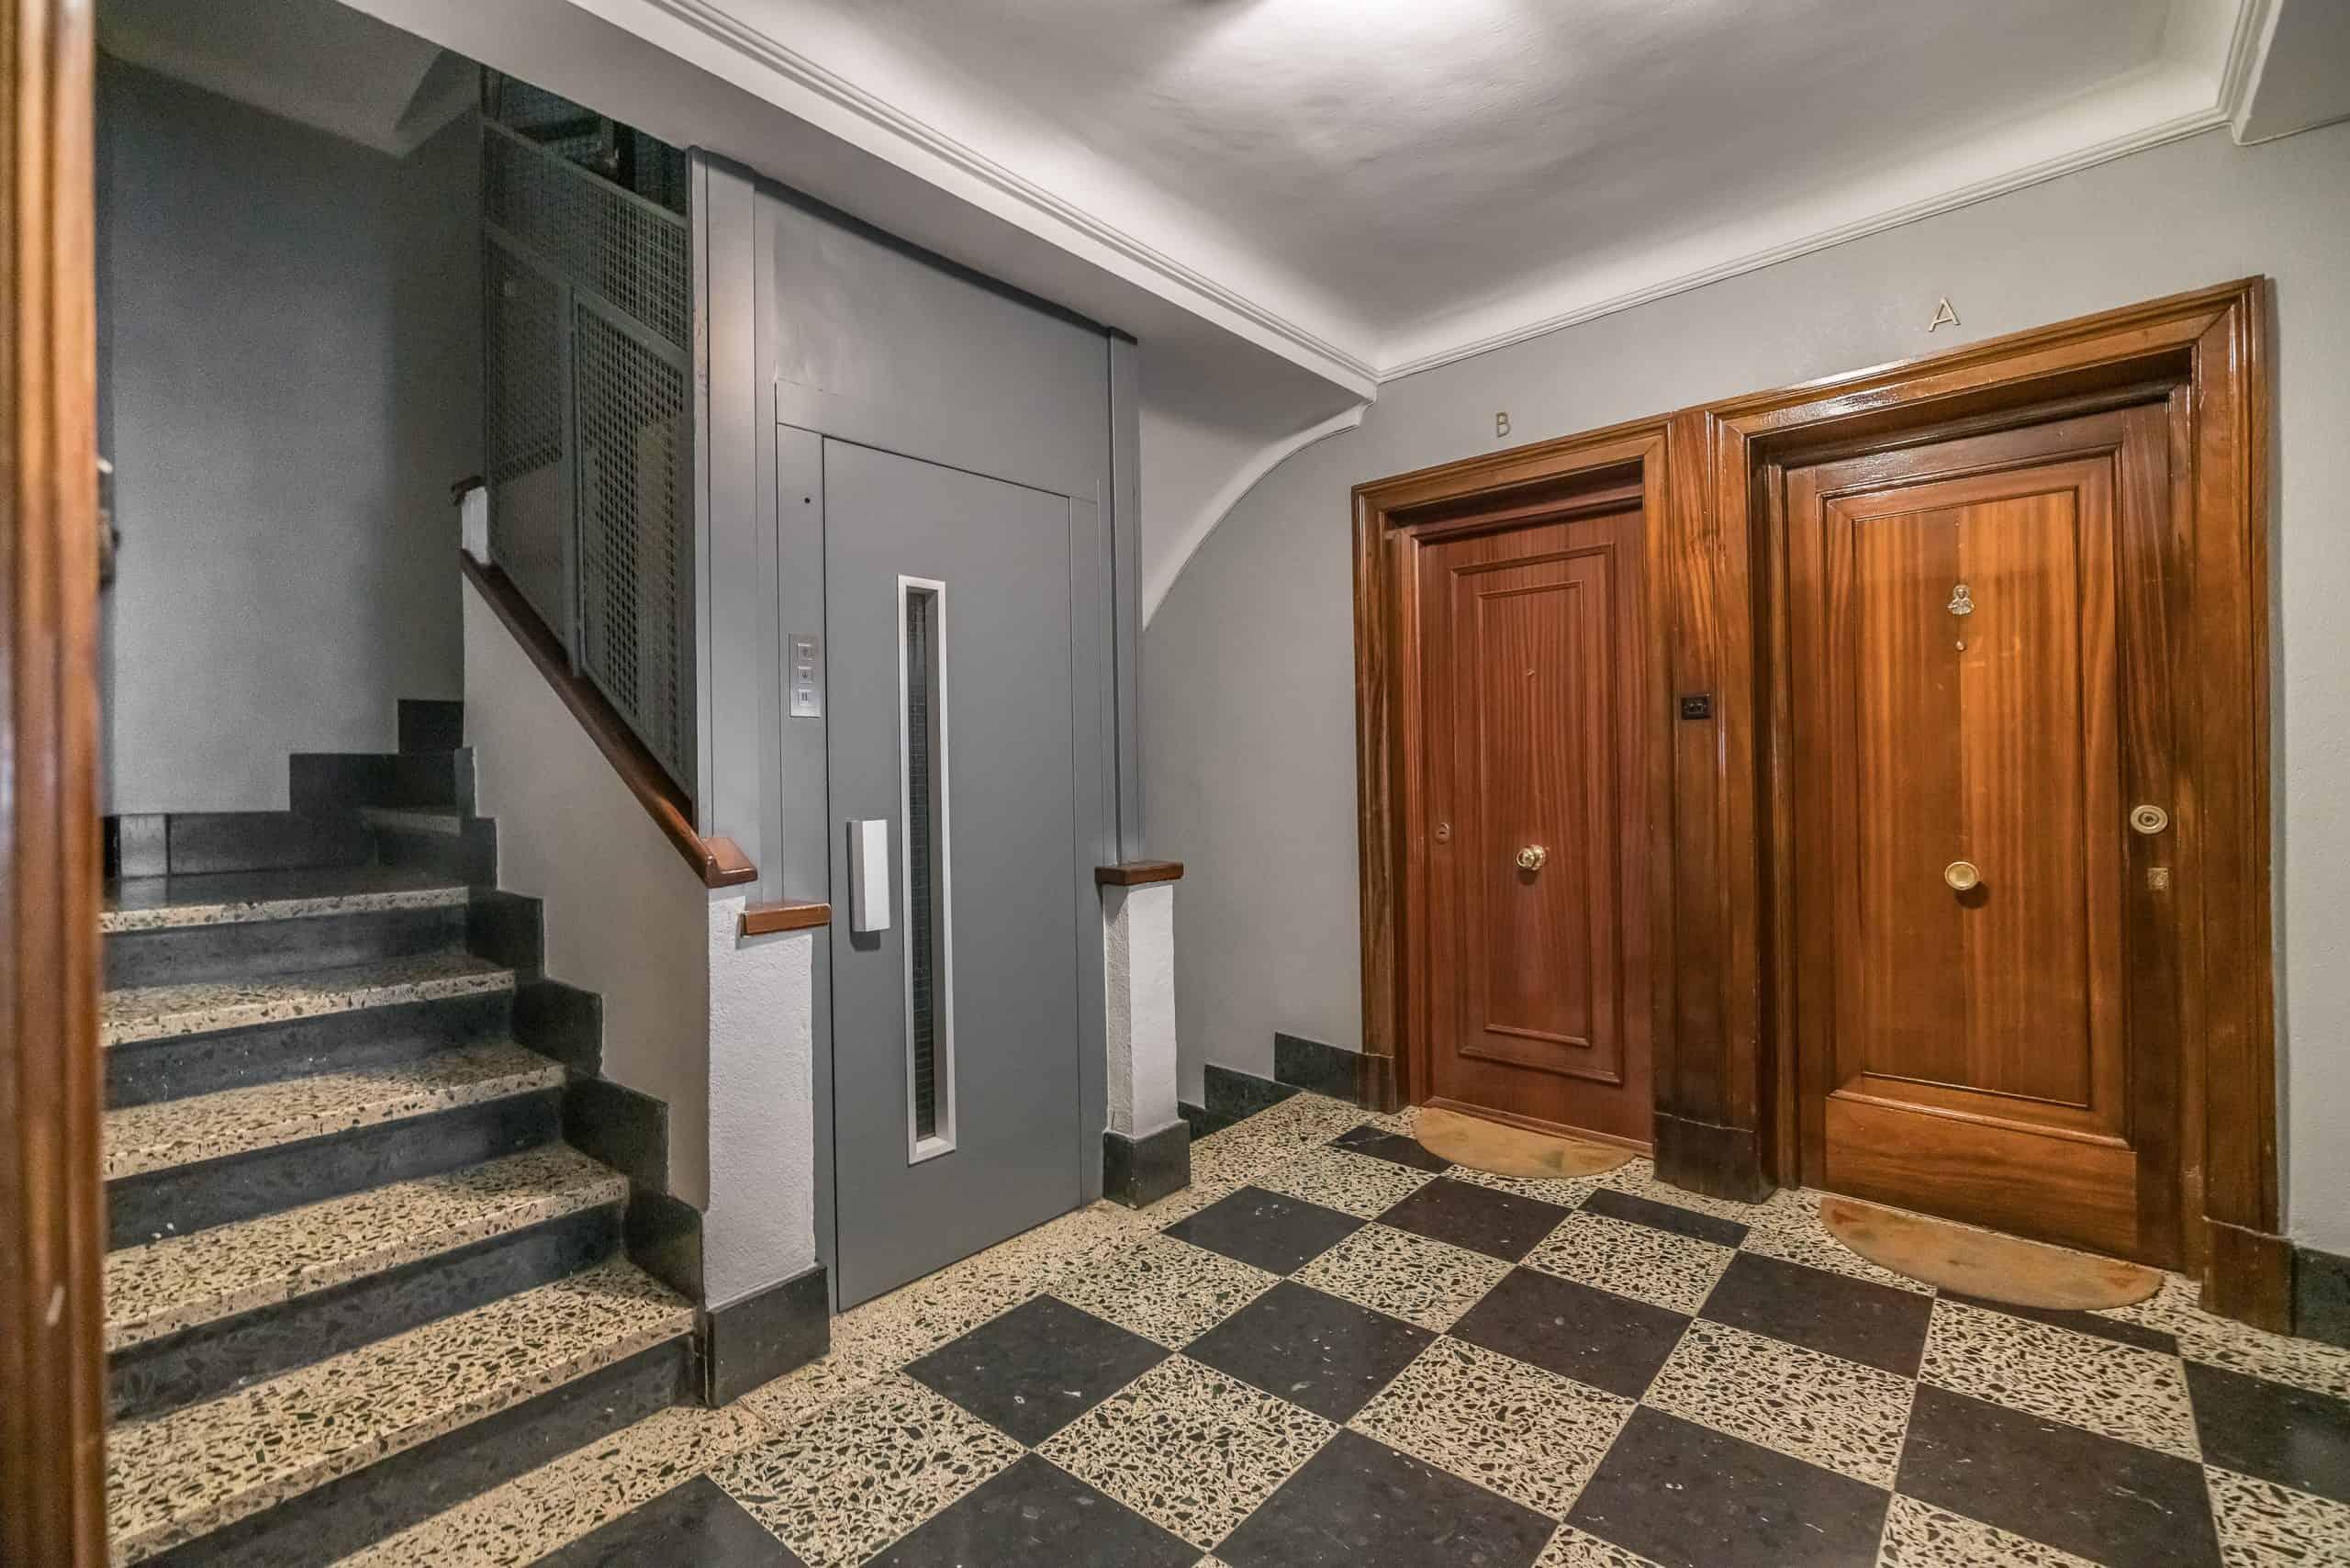 Agencia Inmobiliaria de Madrid-FUTUROCASA-calle Embajadores-Chopera-Arganzuela8 ZONAS COMUNES (1)